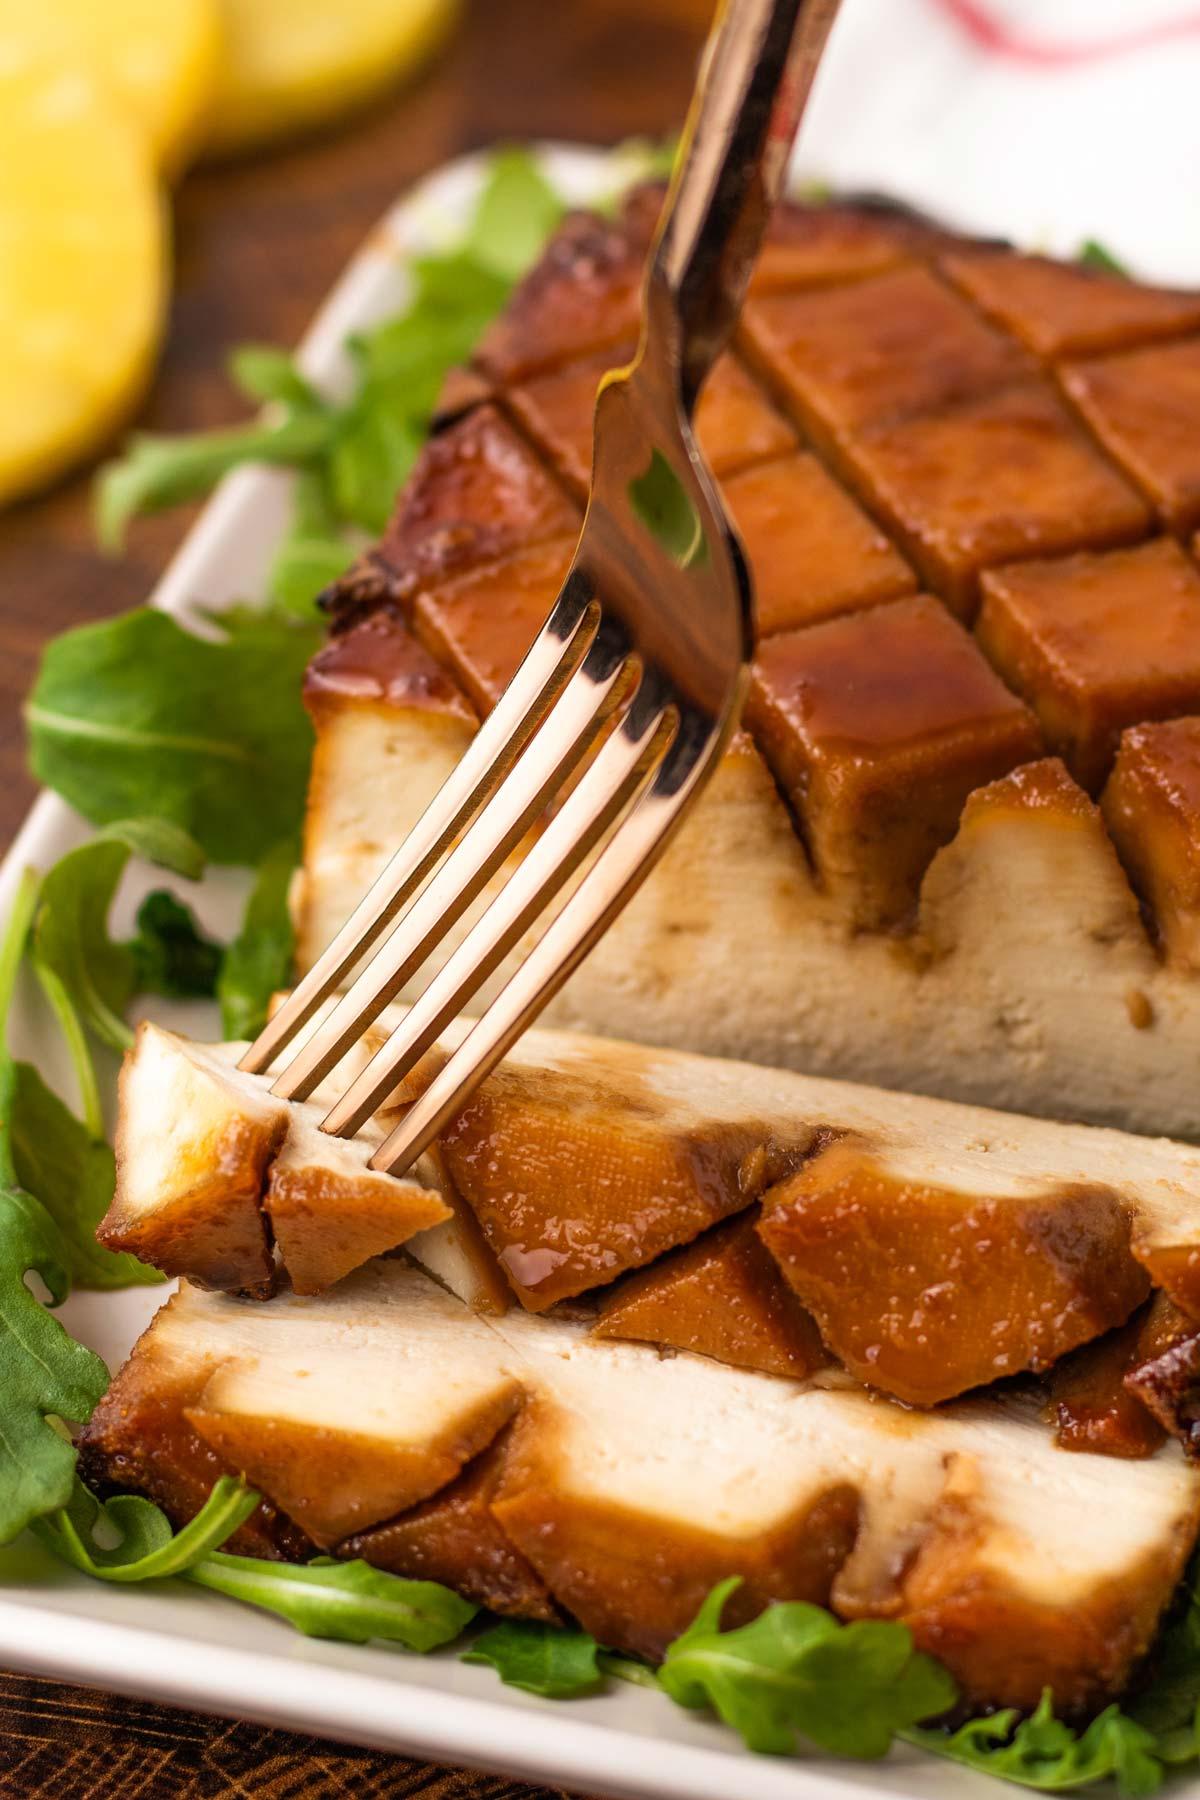 sliced vegan holiday roast with pineapple-soy glaze